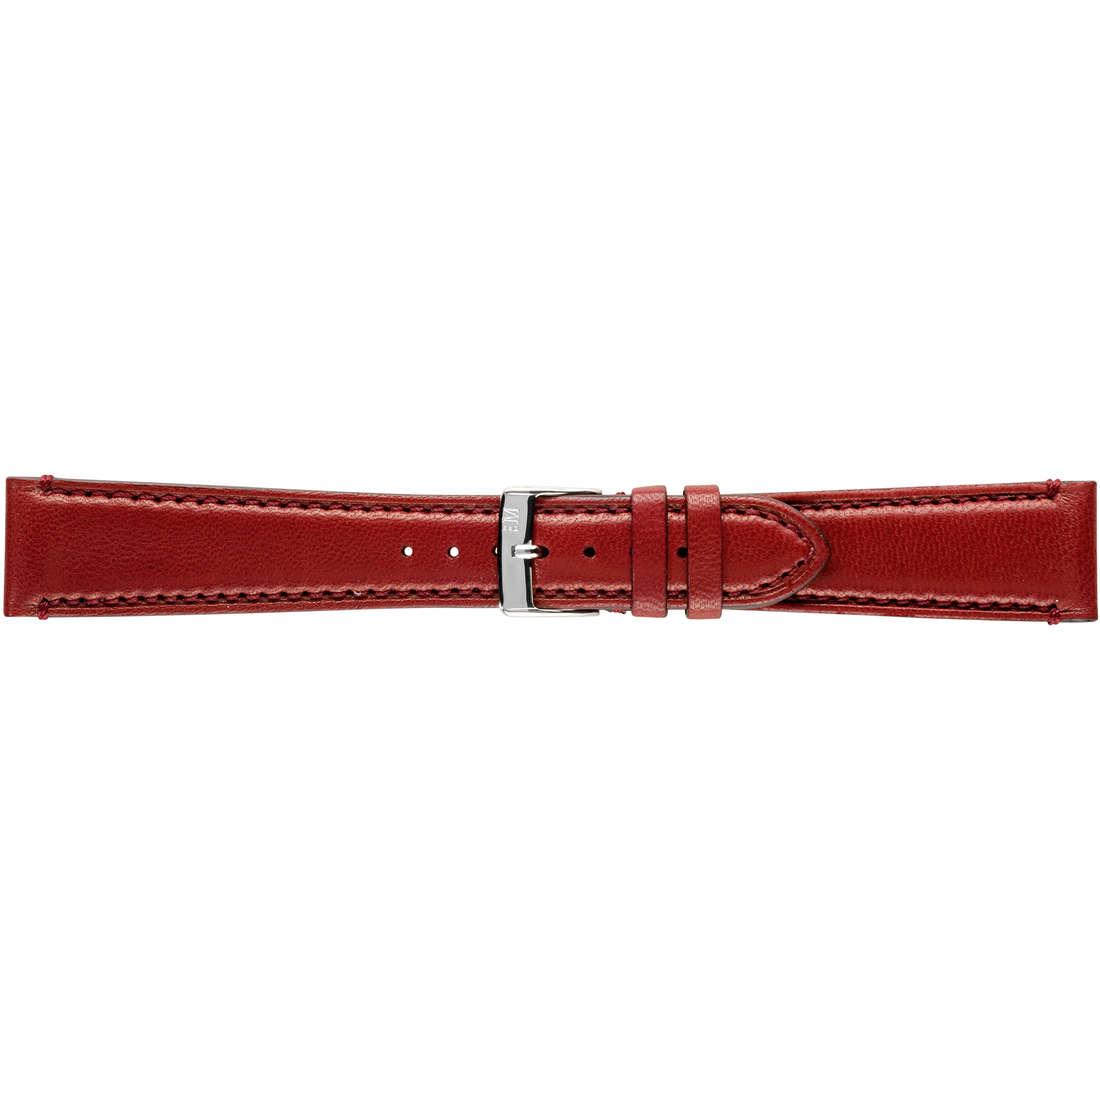 watch watch bands watch straps man Morellato Manufatti A01X3495006182CR14